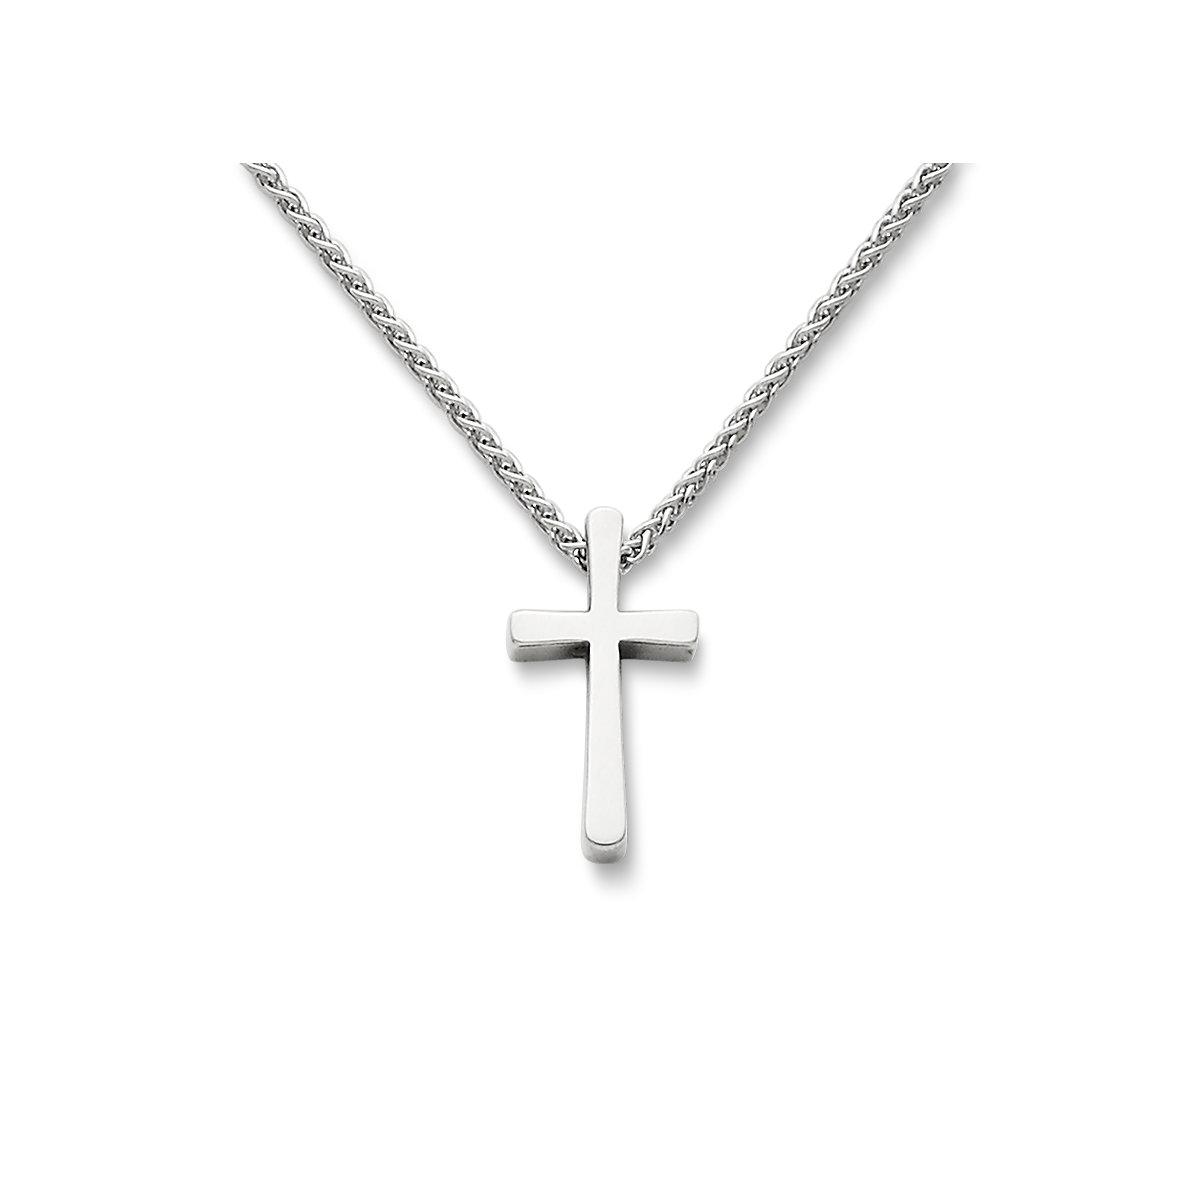 8dba0aa54b7 Silver Necklaces   Pendant Necklaces - James Avery